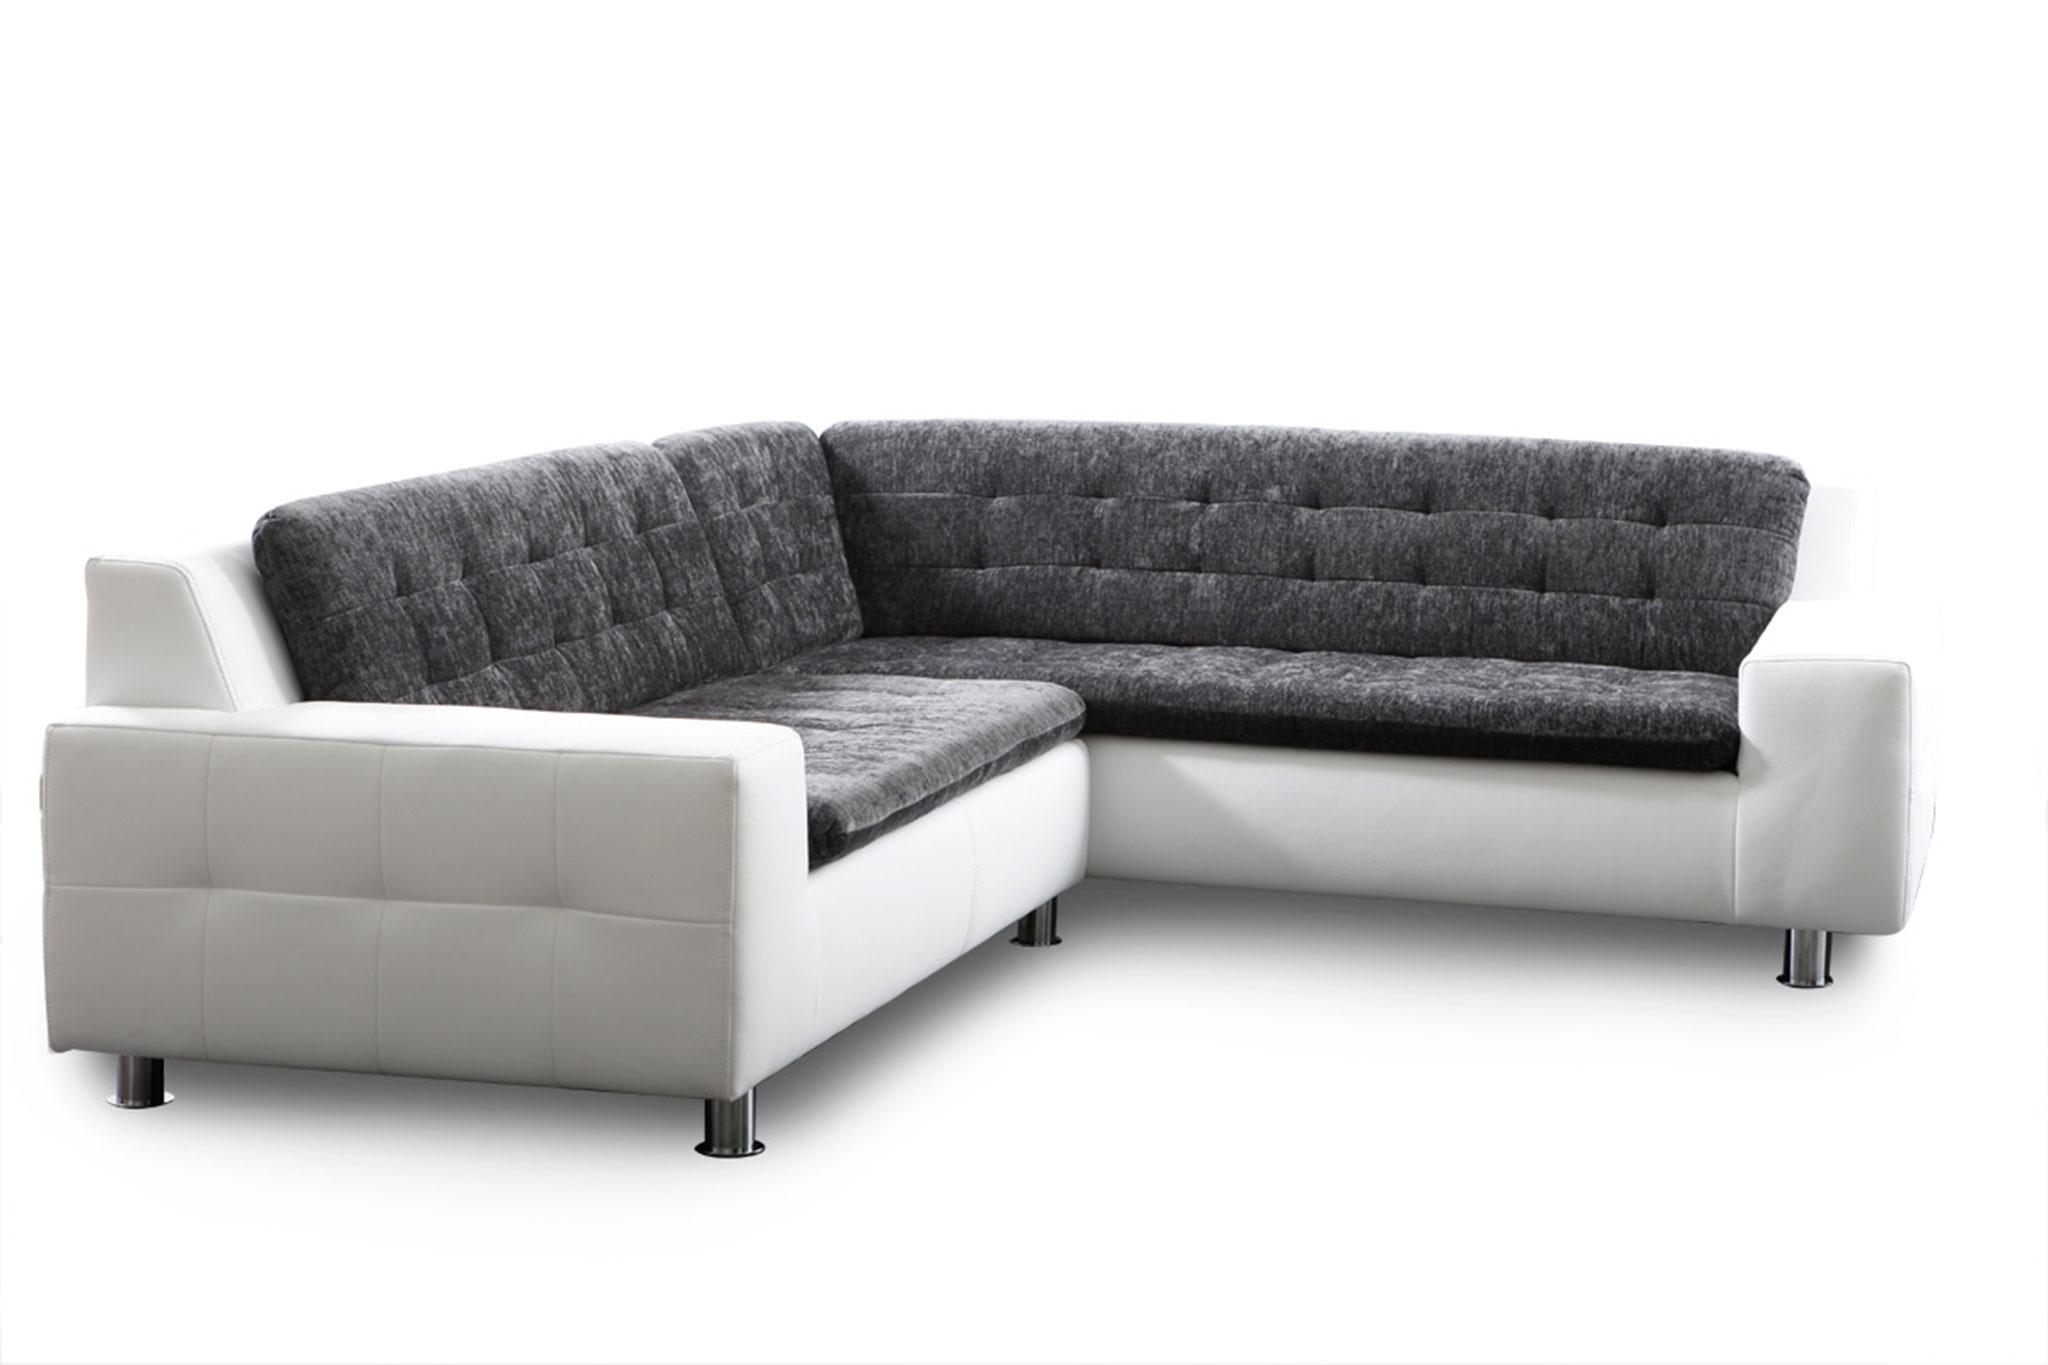 Canape d angle design pas cher Lareduc